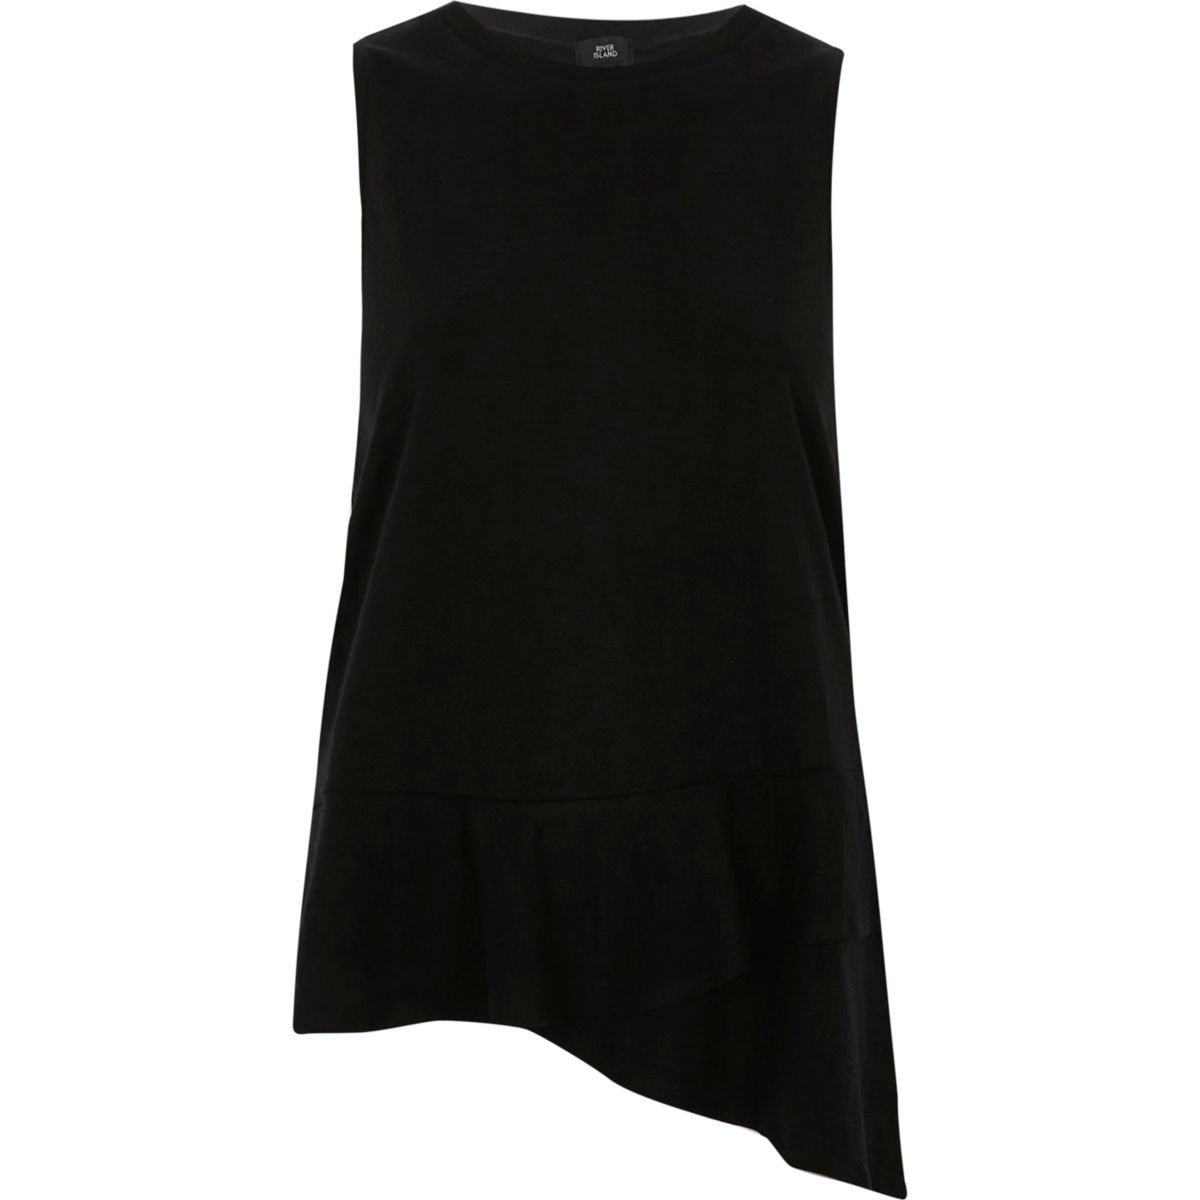 Black layered frill hem tank top